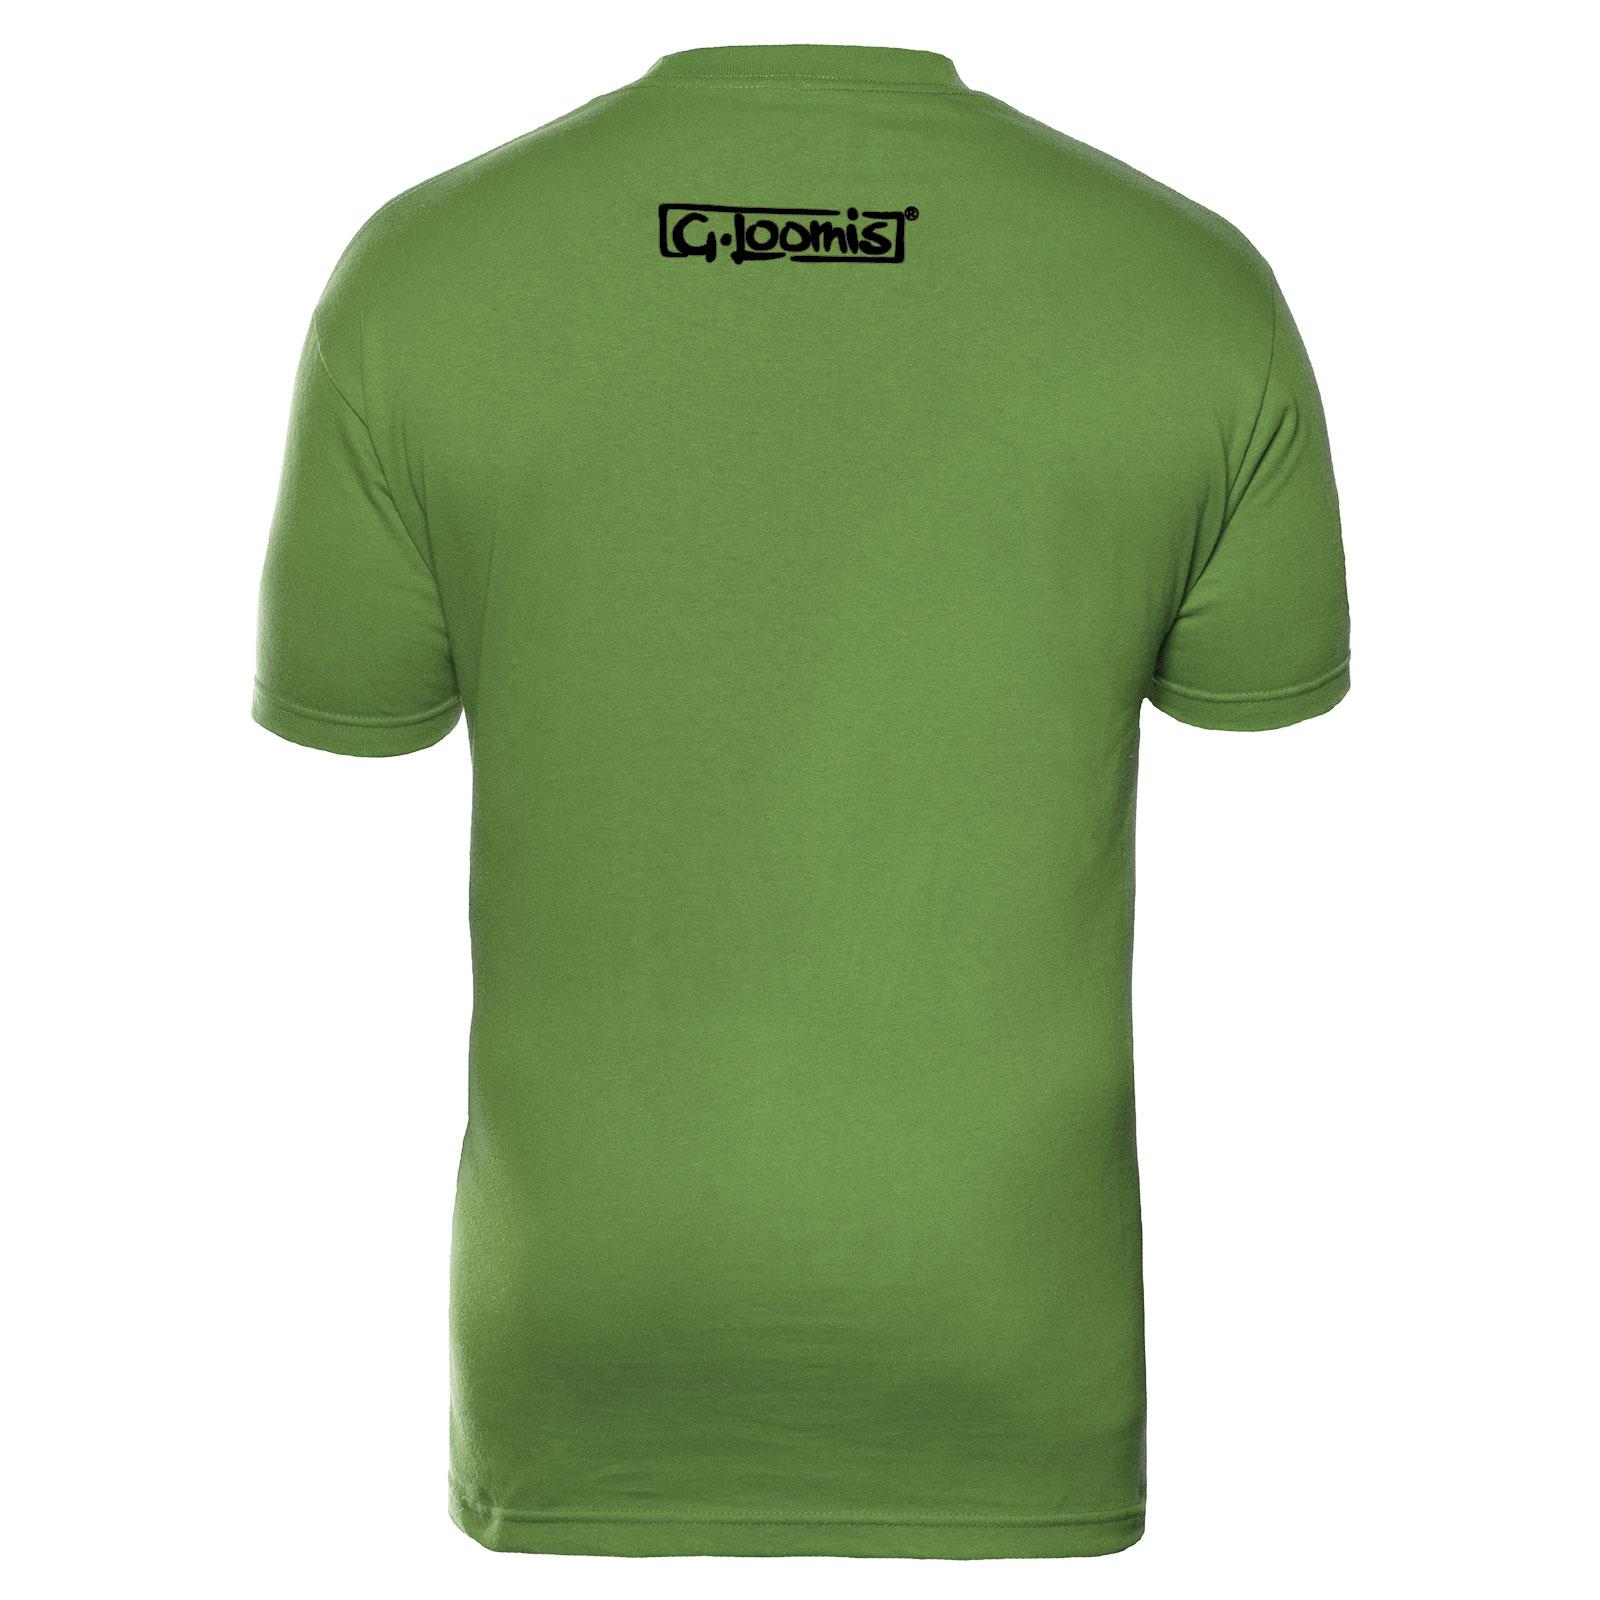 G-Loomis-Skeleton-Fish-Corpo-Short-Sleeve-Fishing-T-Shirt-Select-Size-amp-Color thumbnail 6